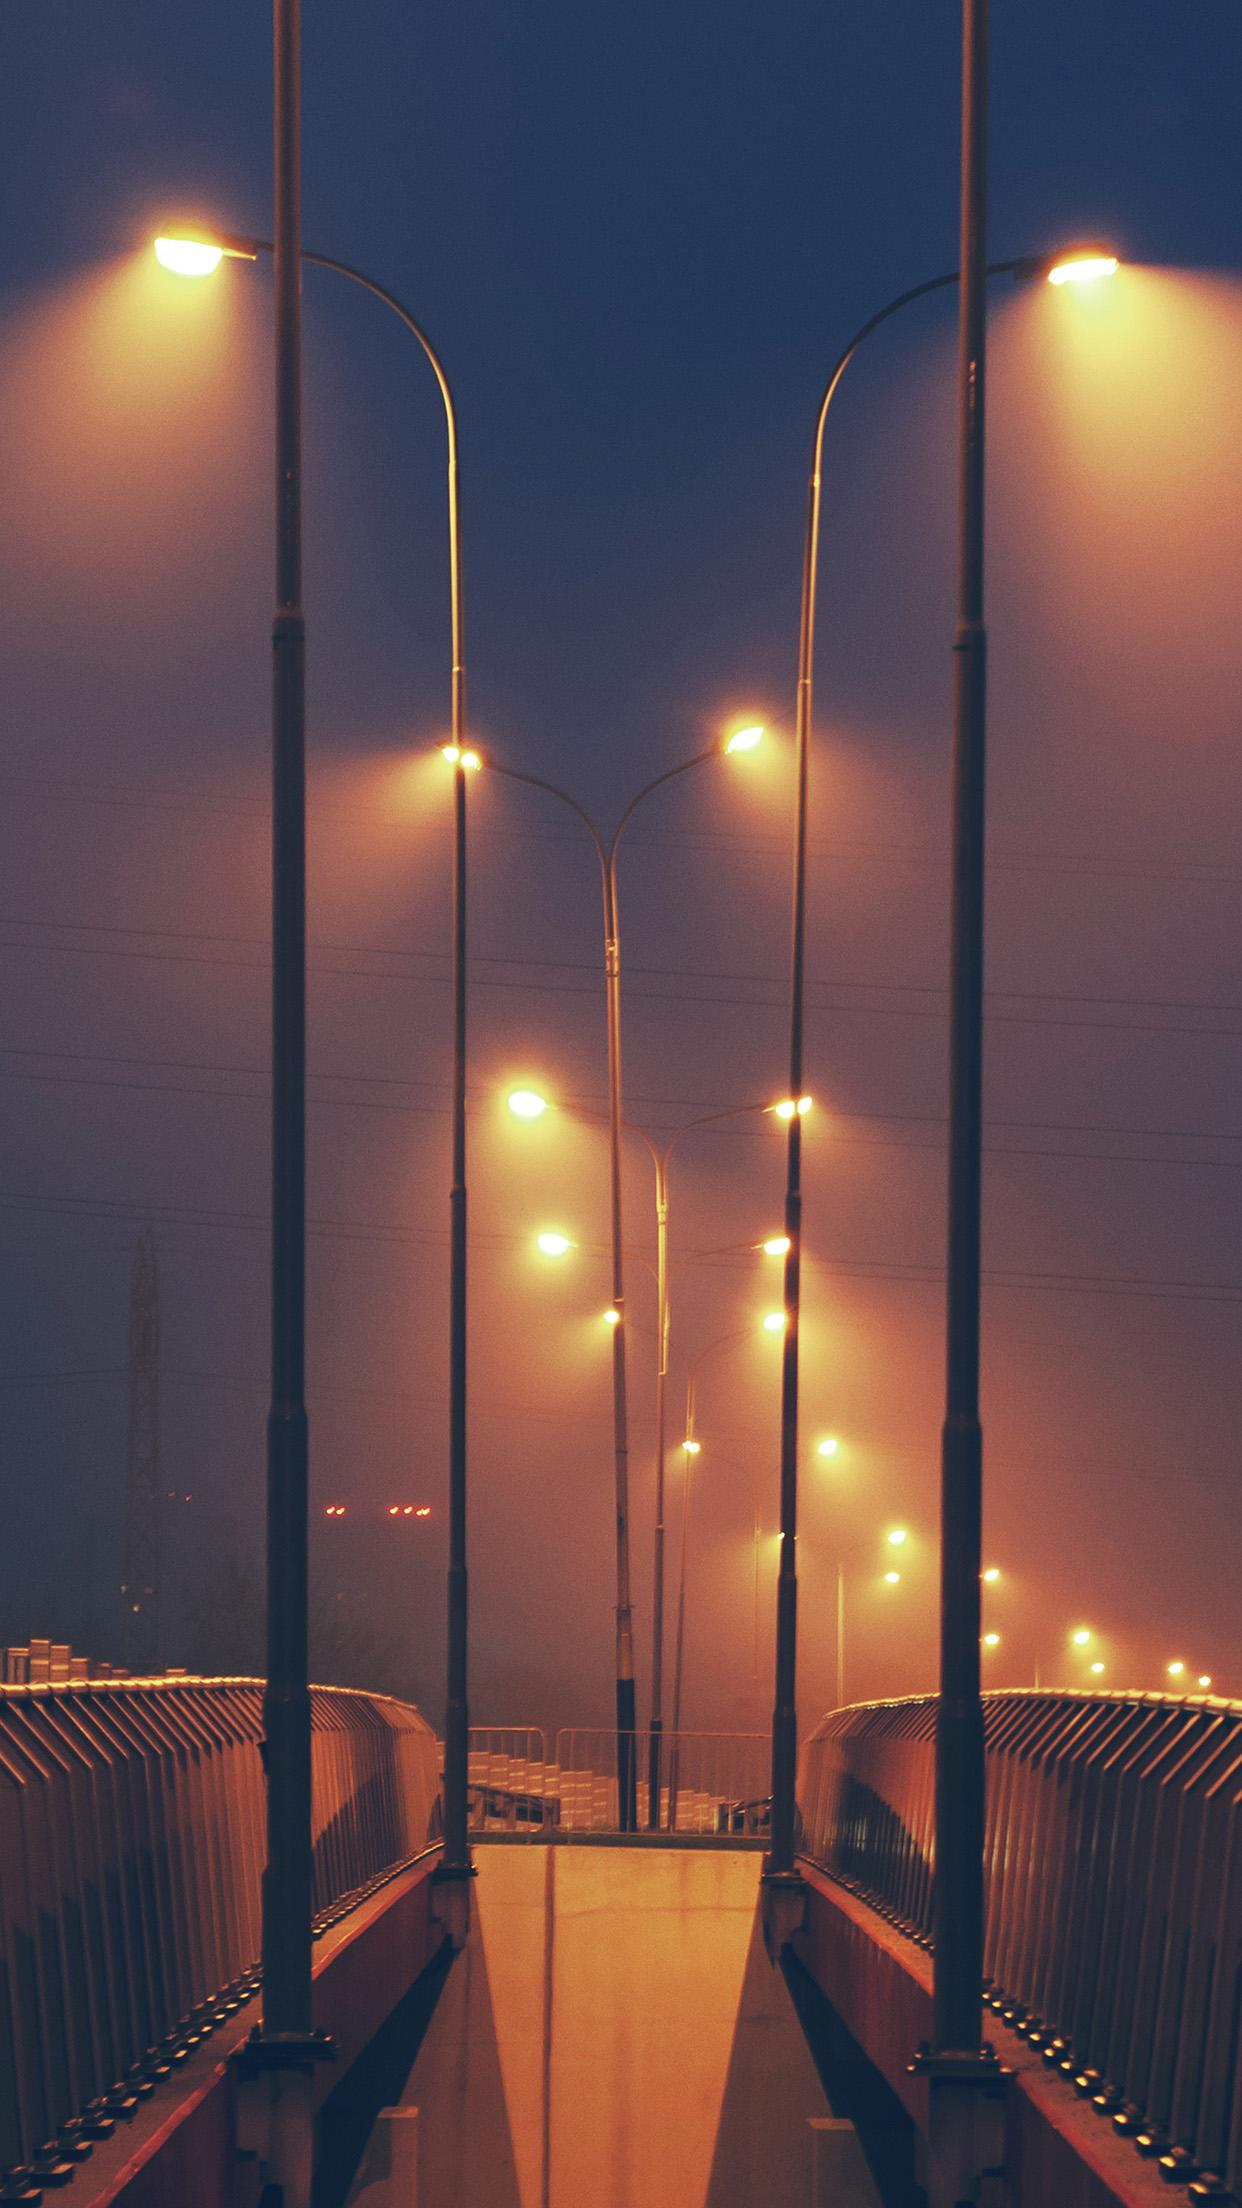 Girl Car Desktop Wallpaper Mv05 Night Bridge City View Lights Street Orange Dark